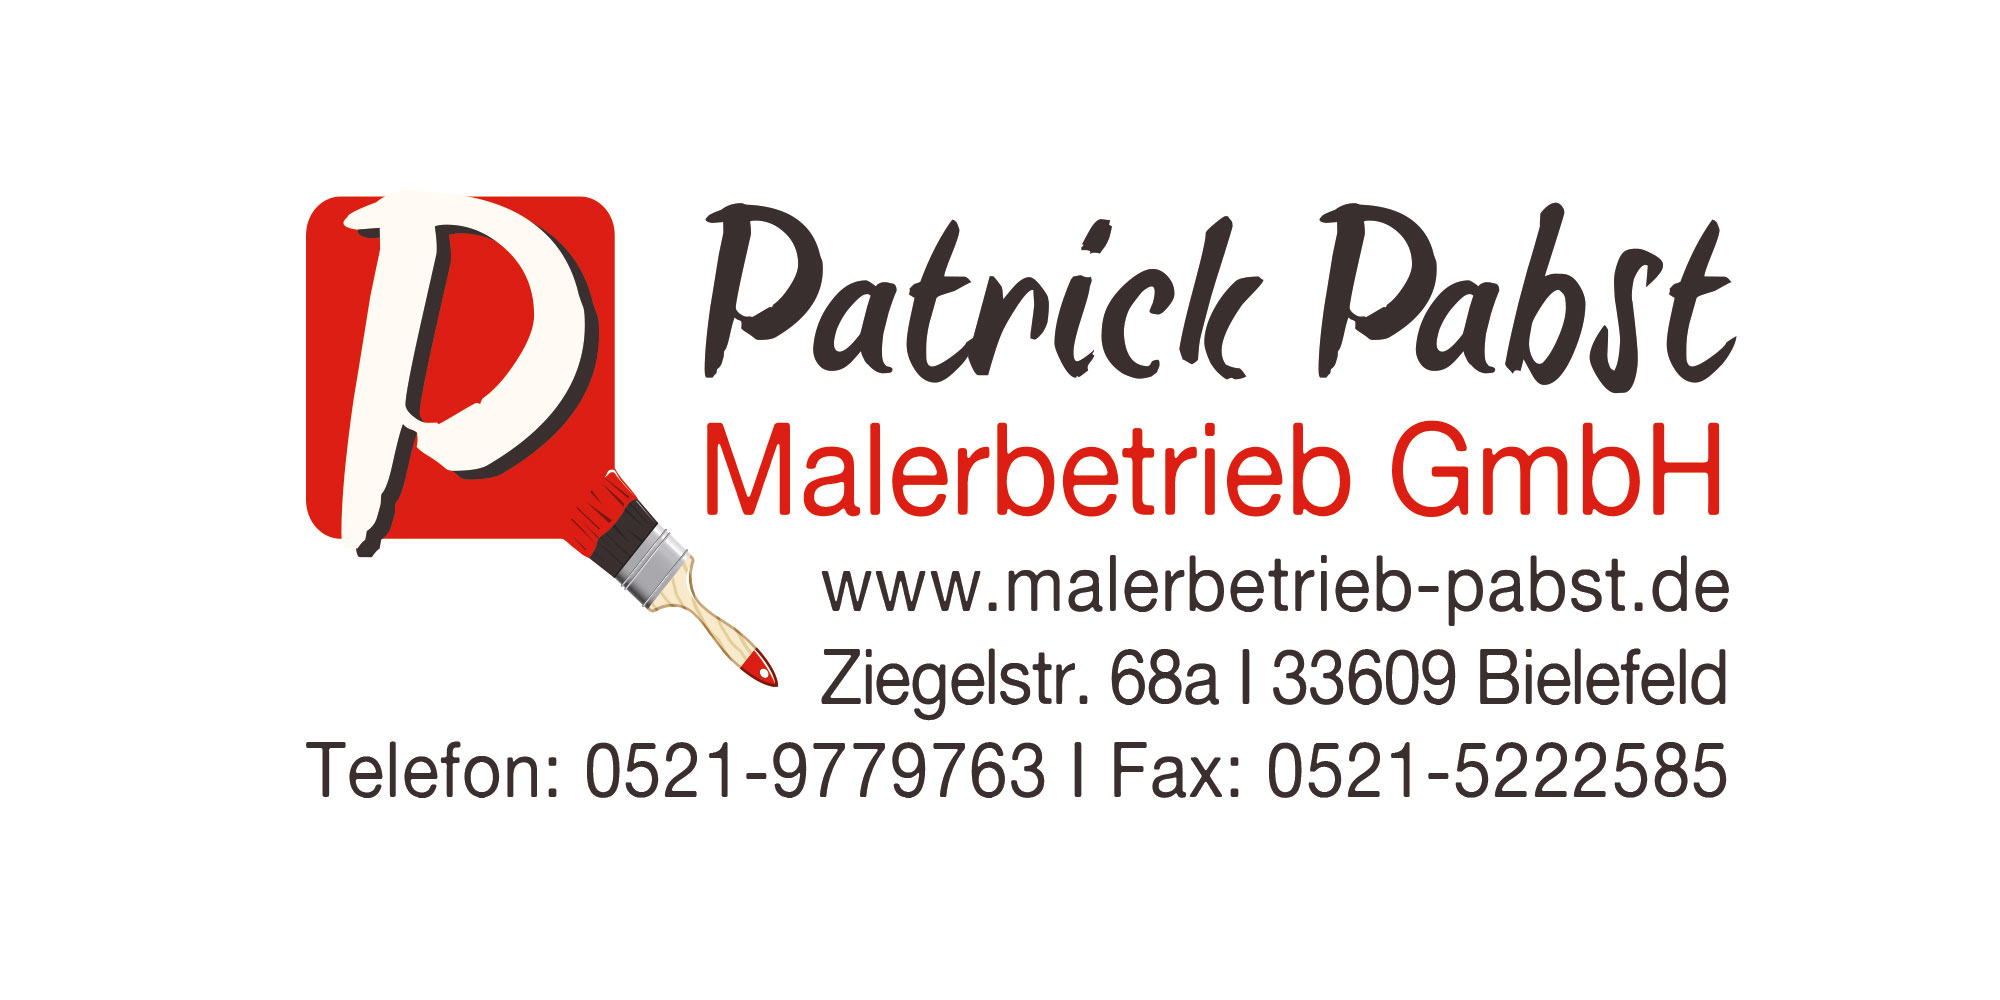 Malerbetrieb Patrick Pabst GmbH